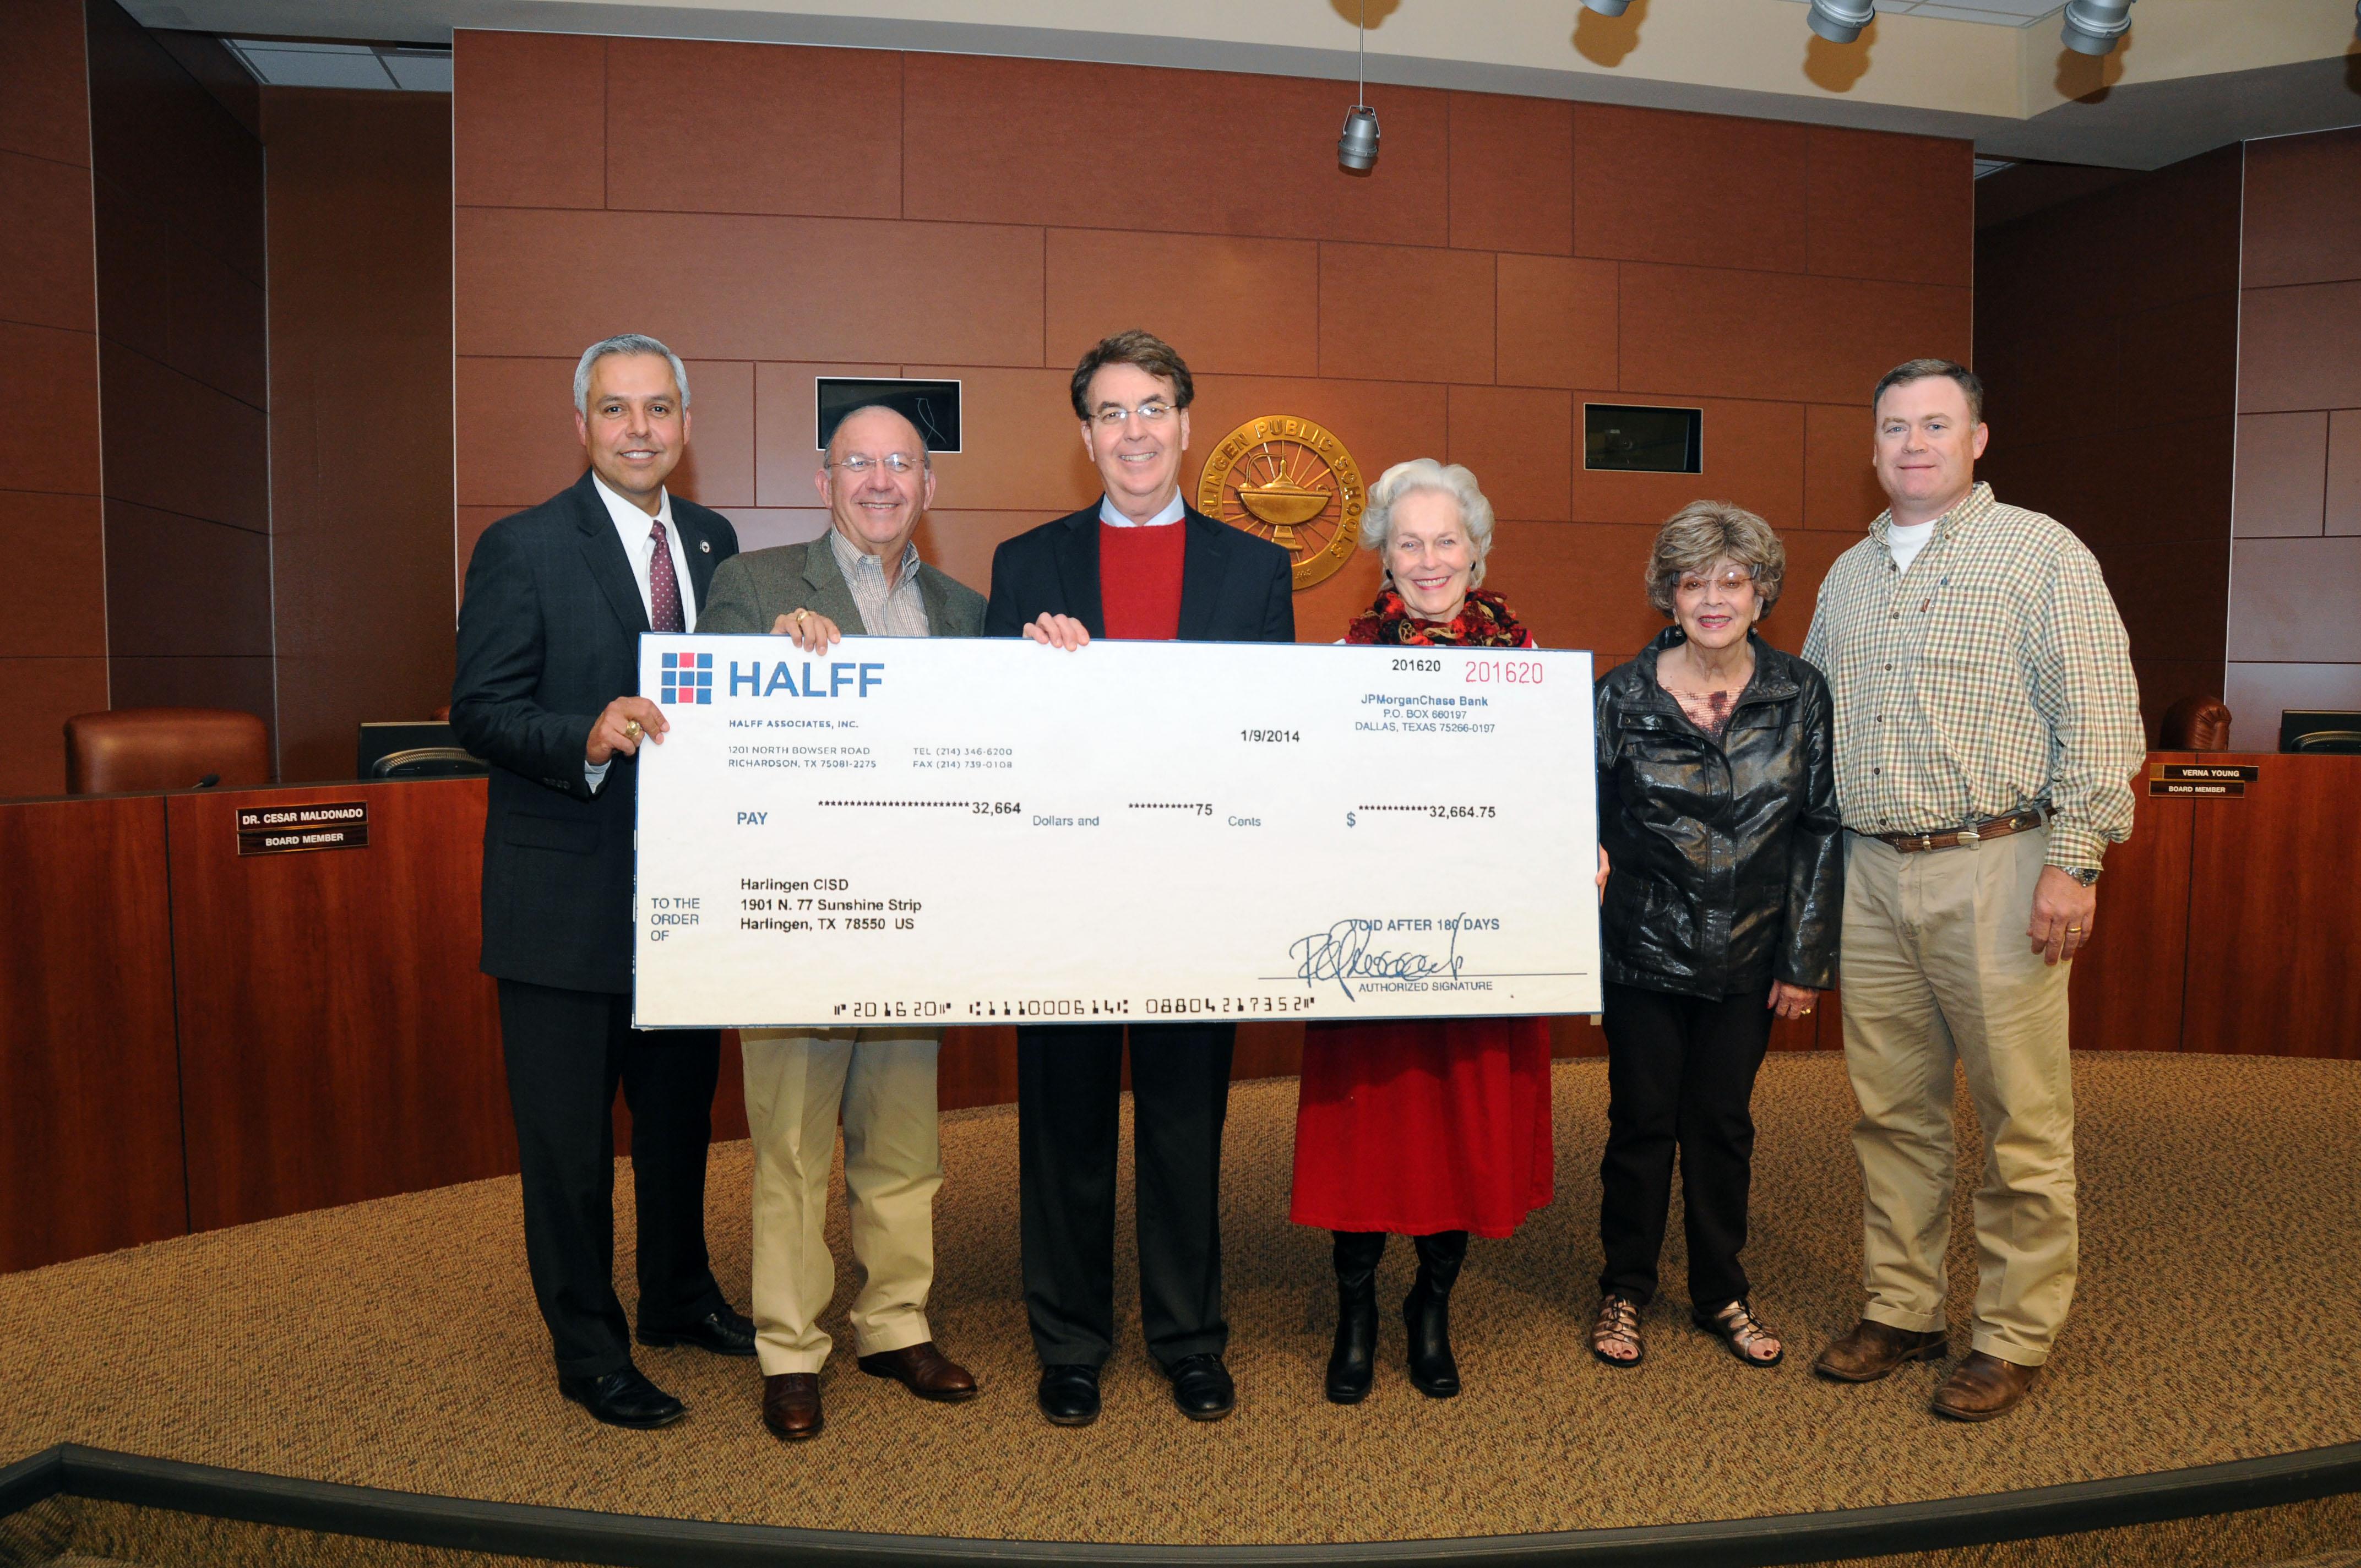 HCISD awarded $32,664.75 for efforts to decrease energy usage